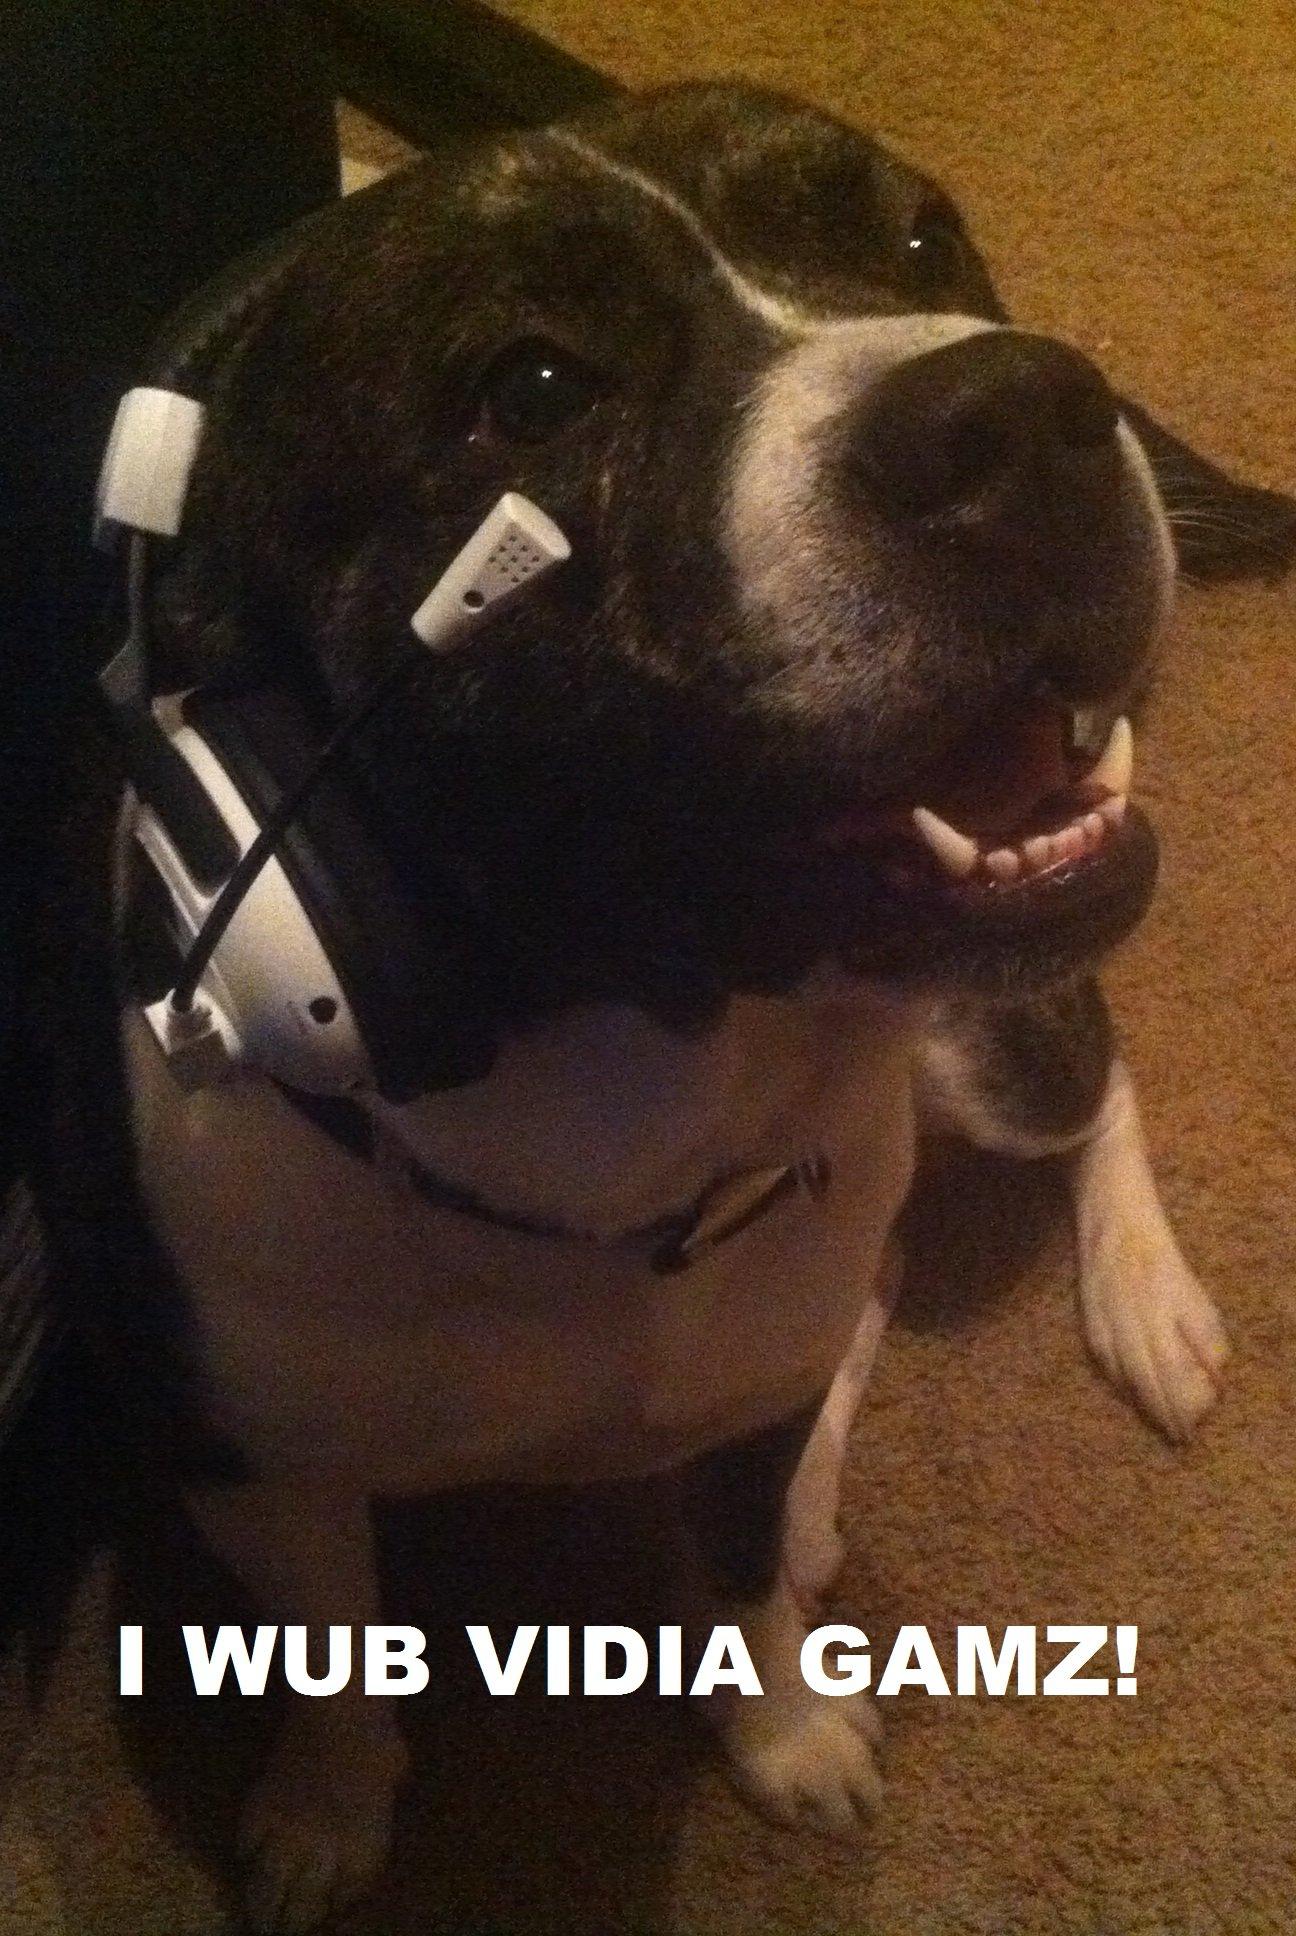 gamer dog loves games